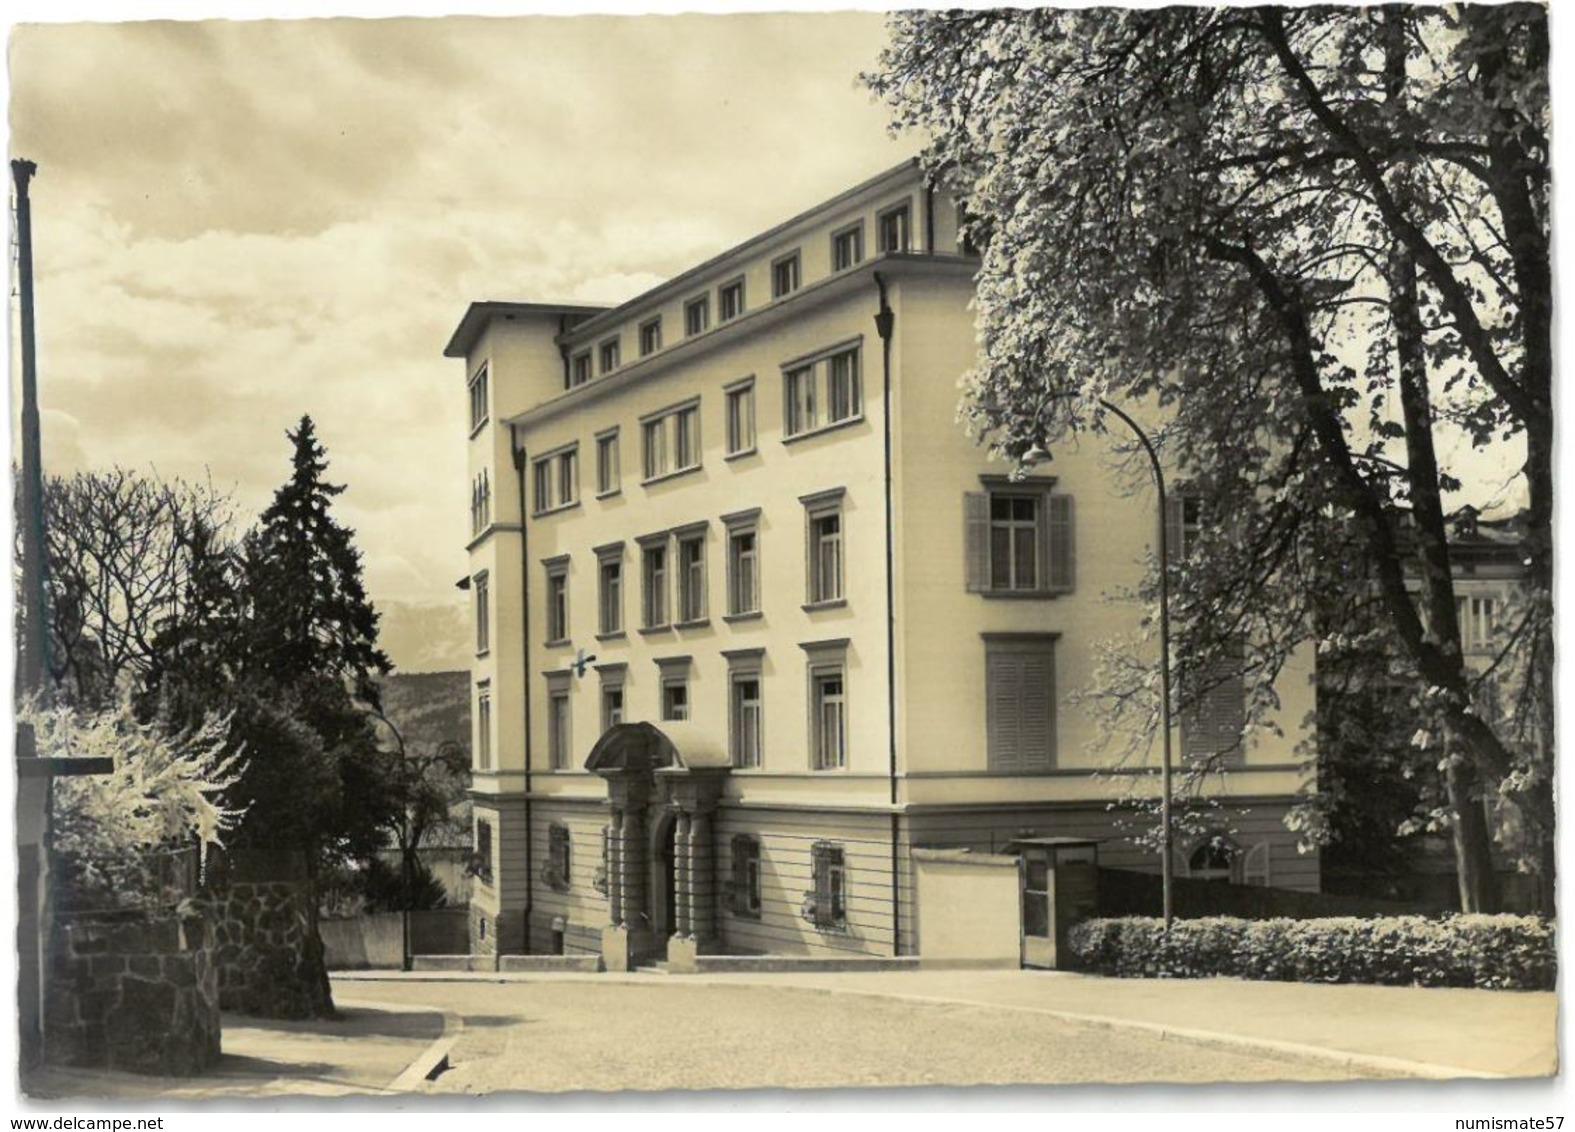 CPSM LUCERNE ( LUZERN ) - Institution SAINTE Agnès - Aile Abendweg - Foto U.Verlag O. Pfeifer - LU Lucerne